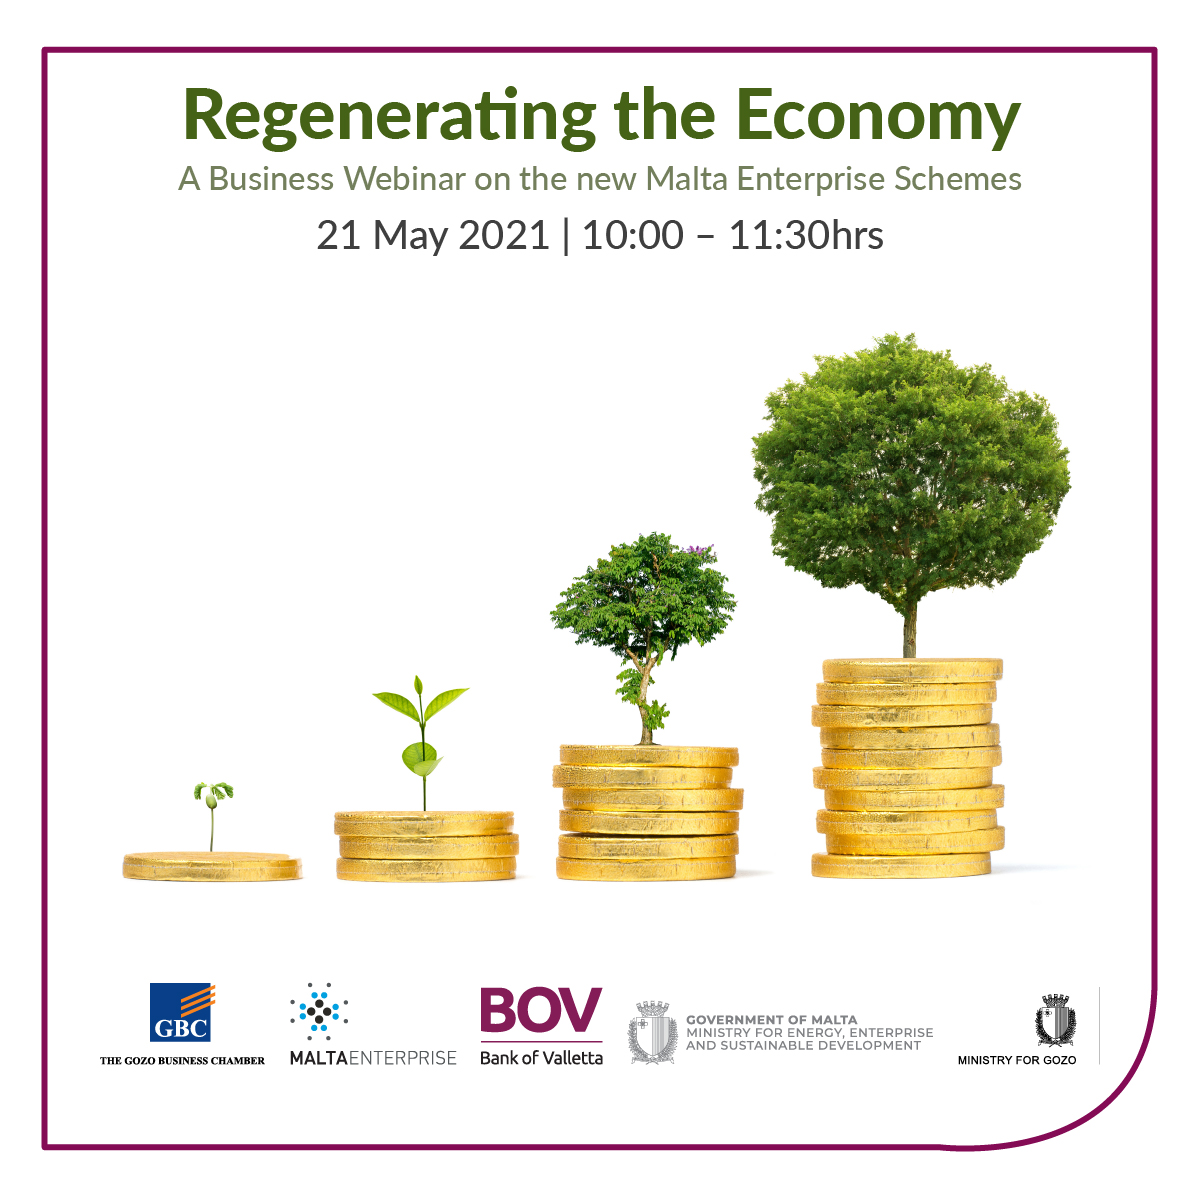 Regenerating the economy – a business webinar on the new Malta Enterprise Schemes